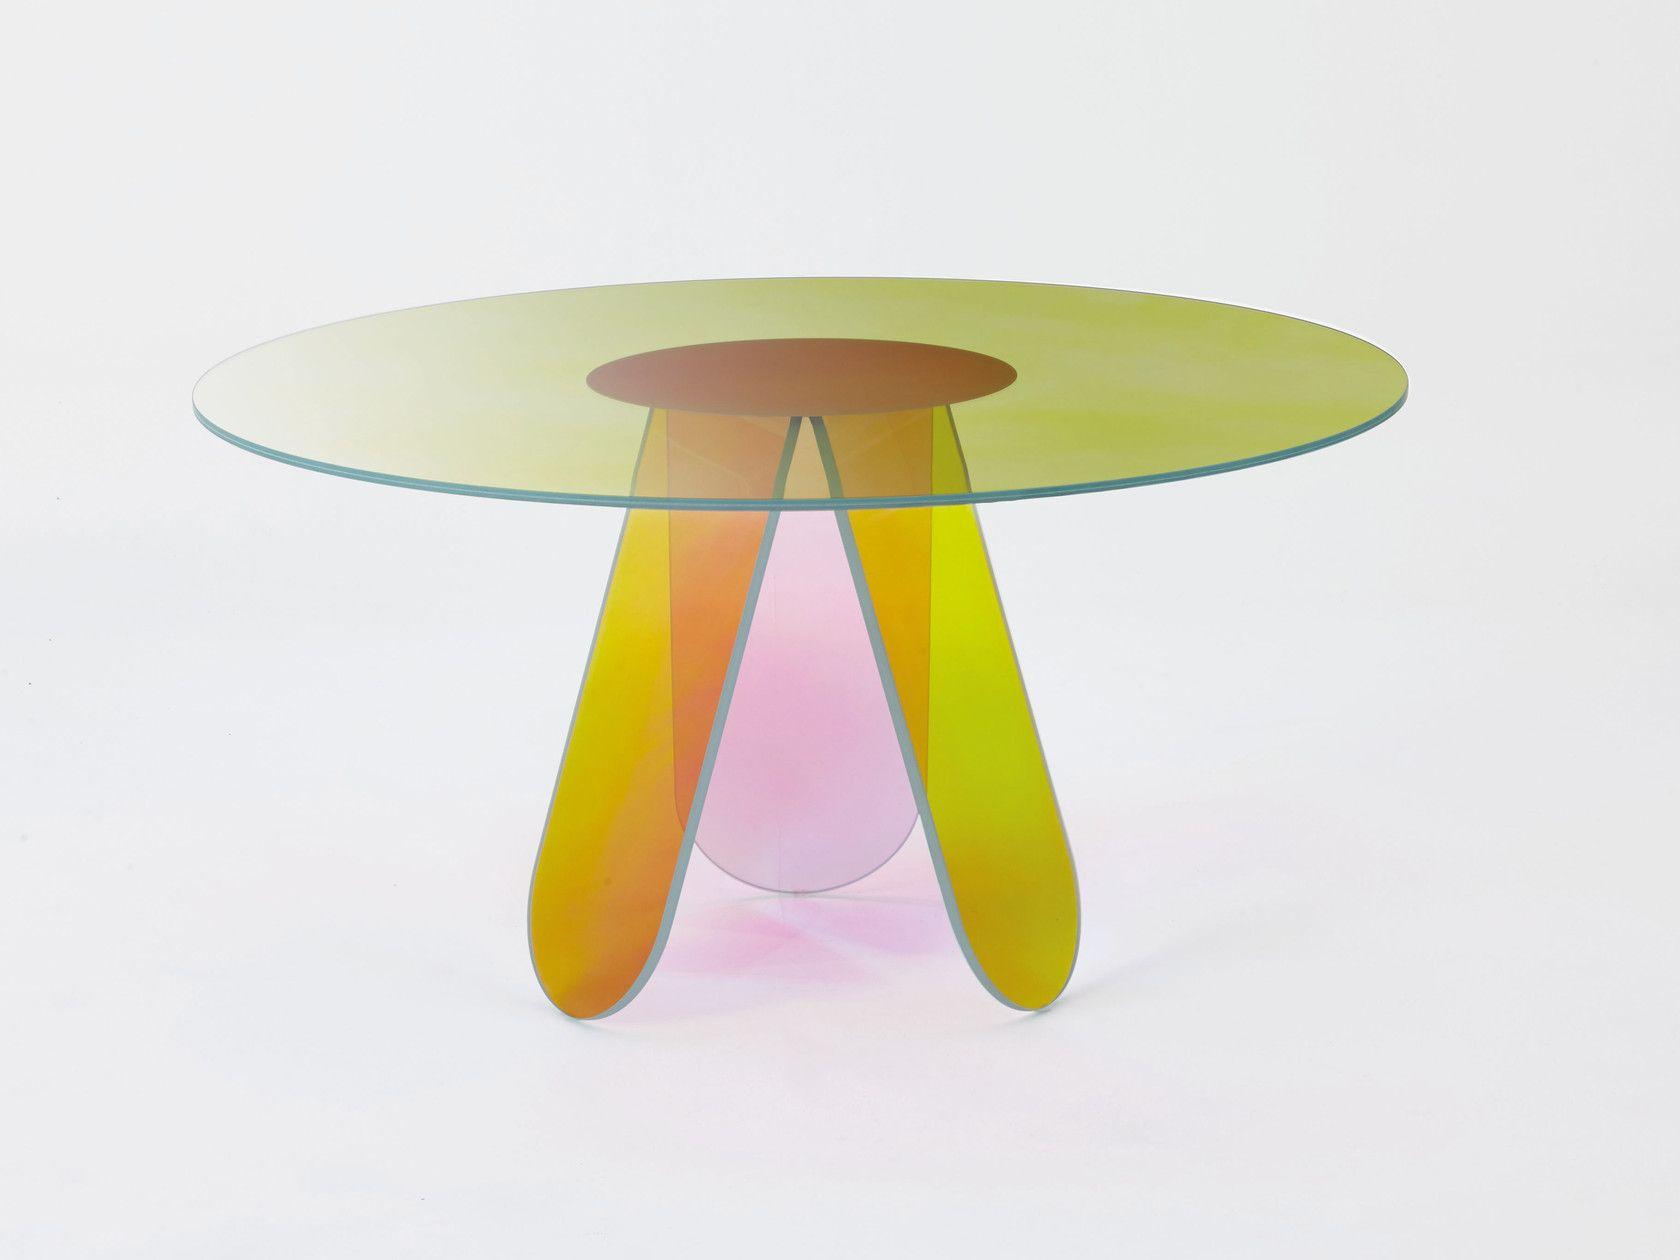 Shimmer Stol Kollekciya Shimmer By Glas Italia Dizajn Patricia Urquiola In 2020 Dining Table Design Contemporary Dining Table Dining Table